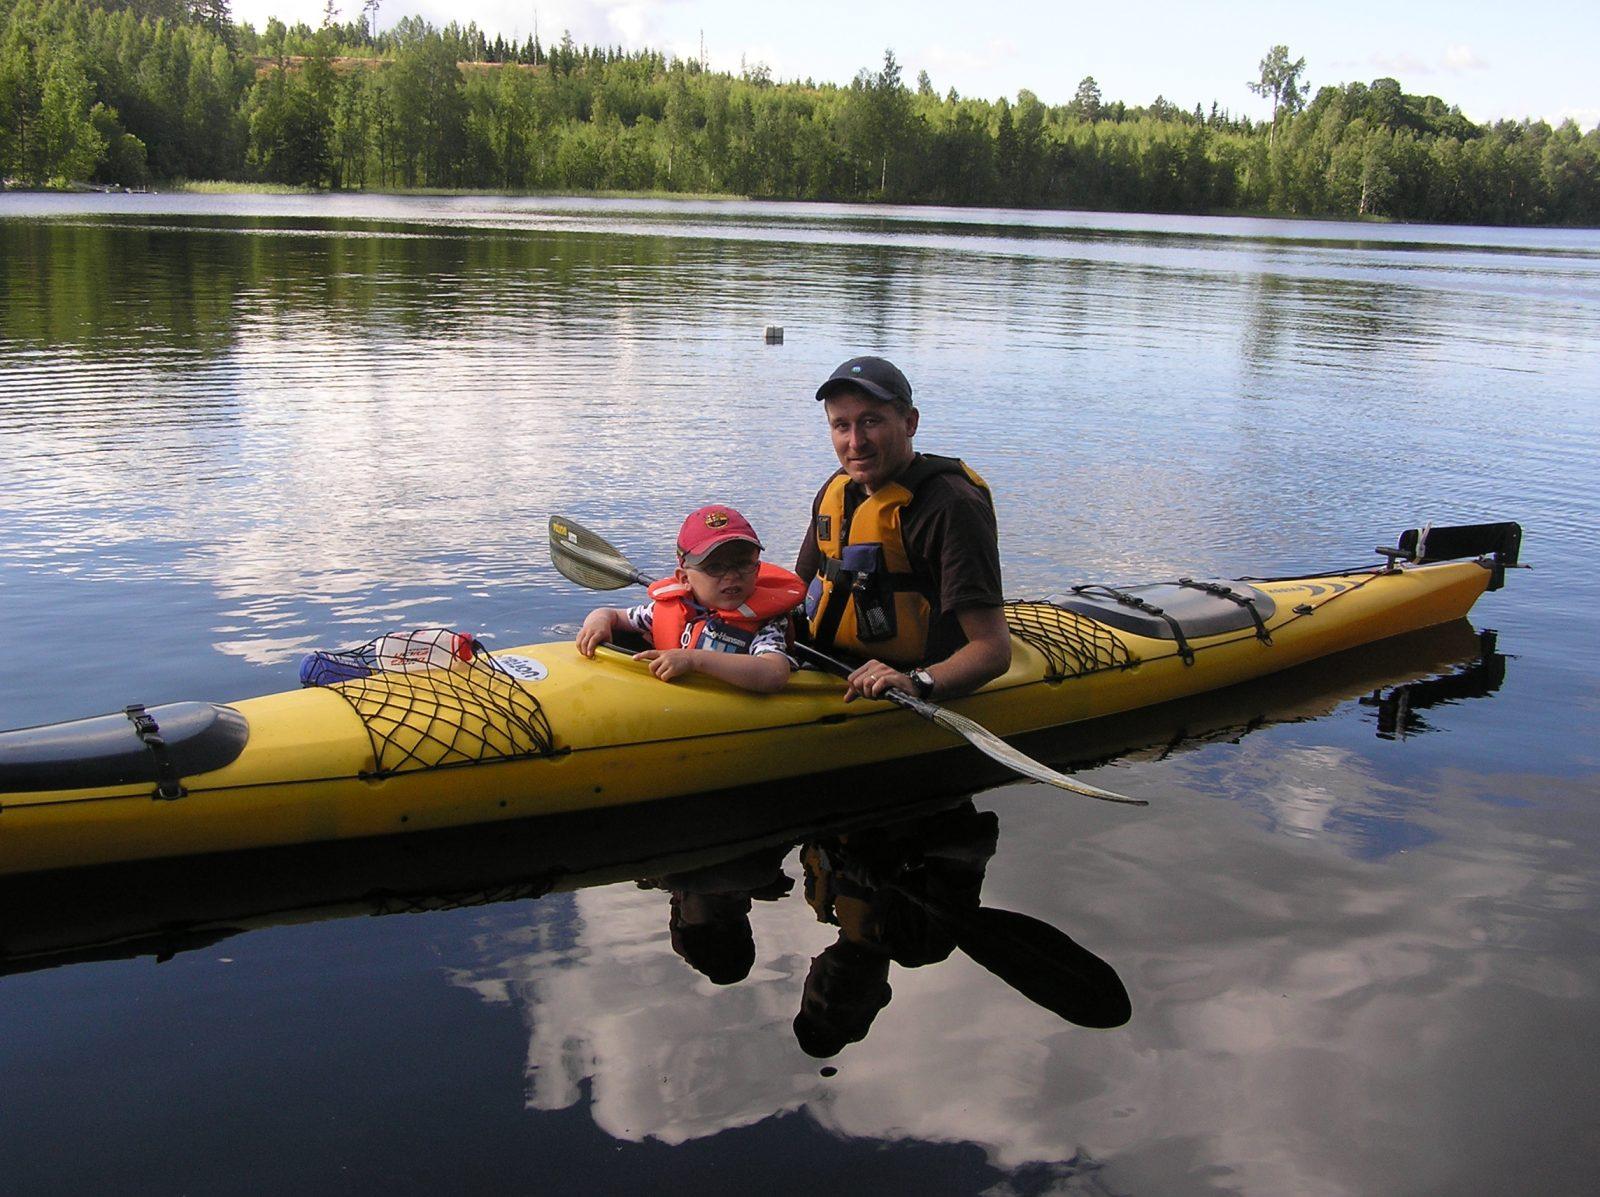 Kayaking trip to Punkaharju Ridgearea